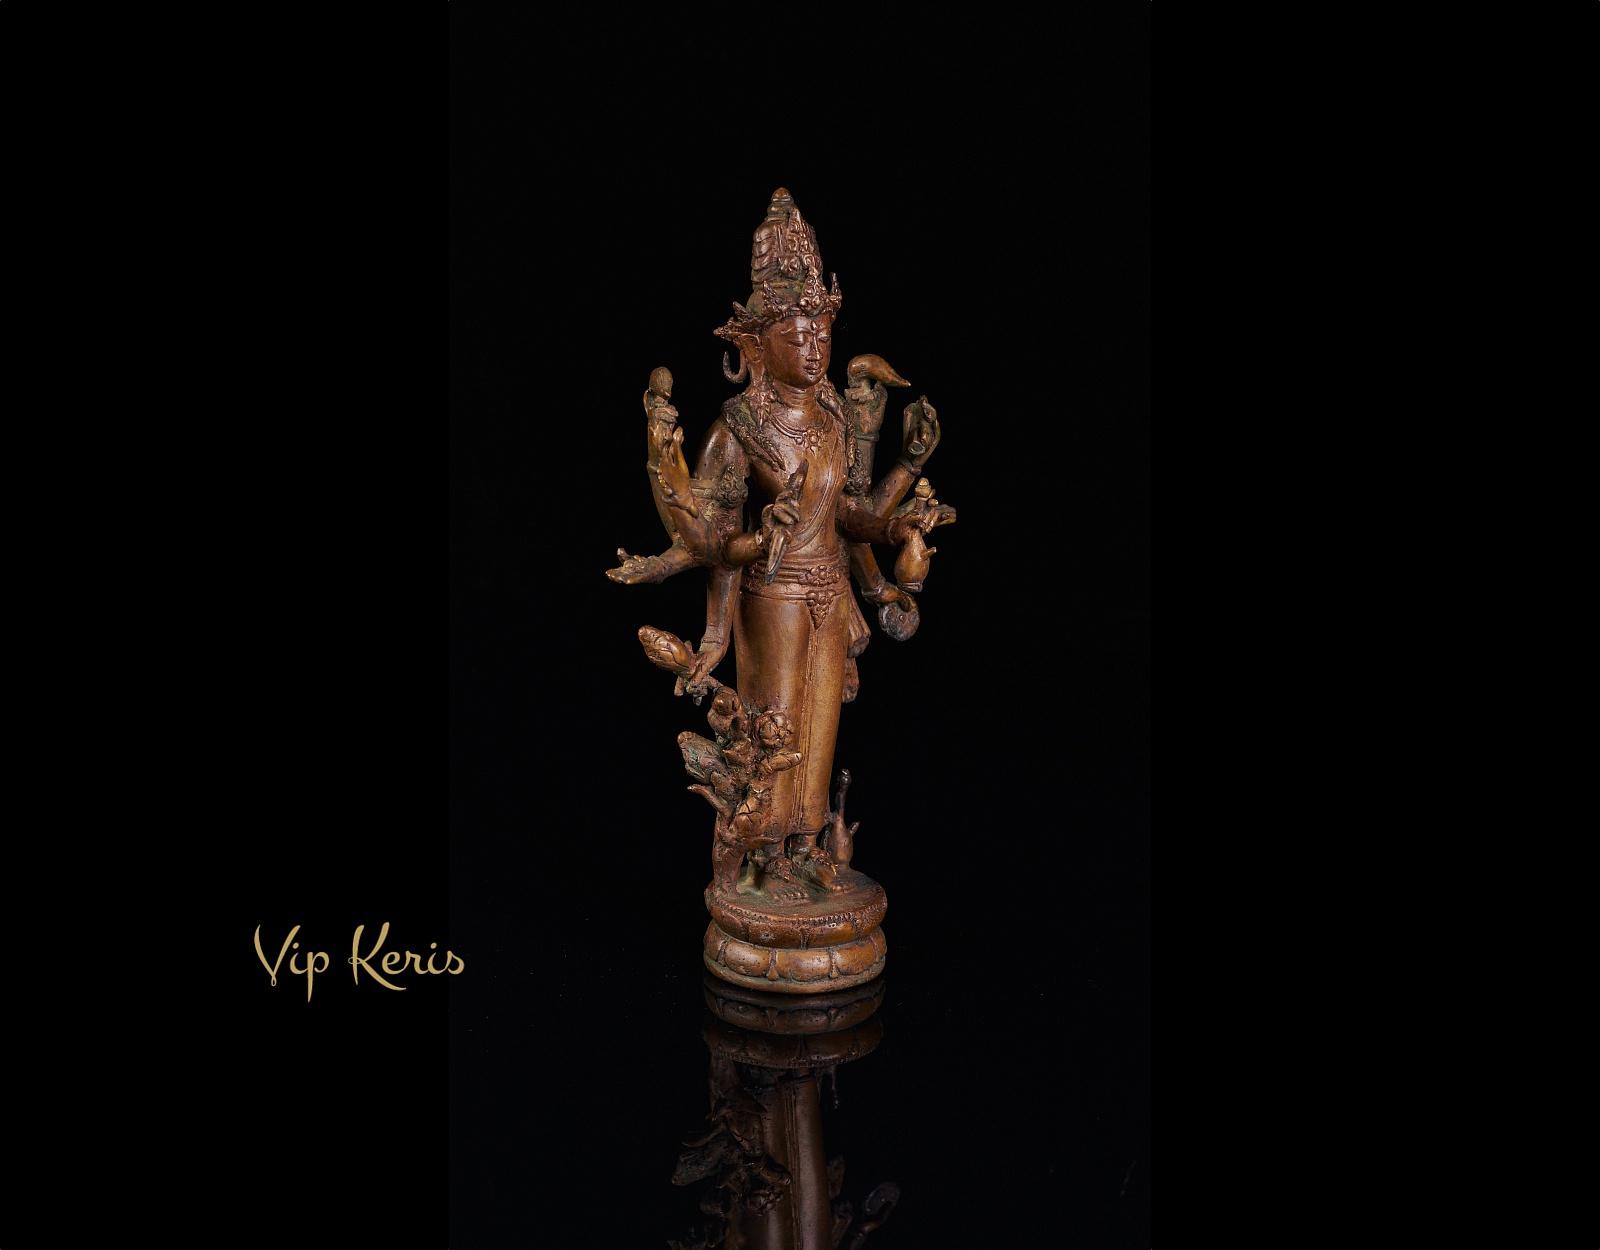 Алтарная бронзовая статуя Шивы, 24 см  фото VipKeris